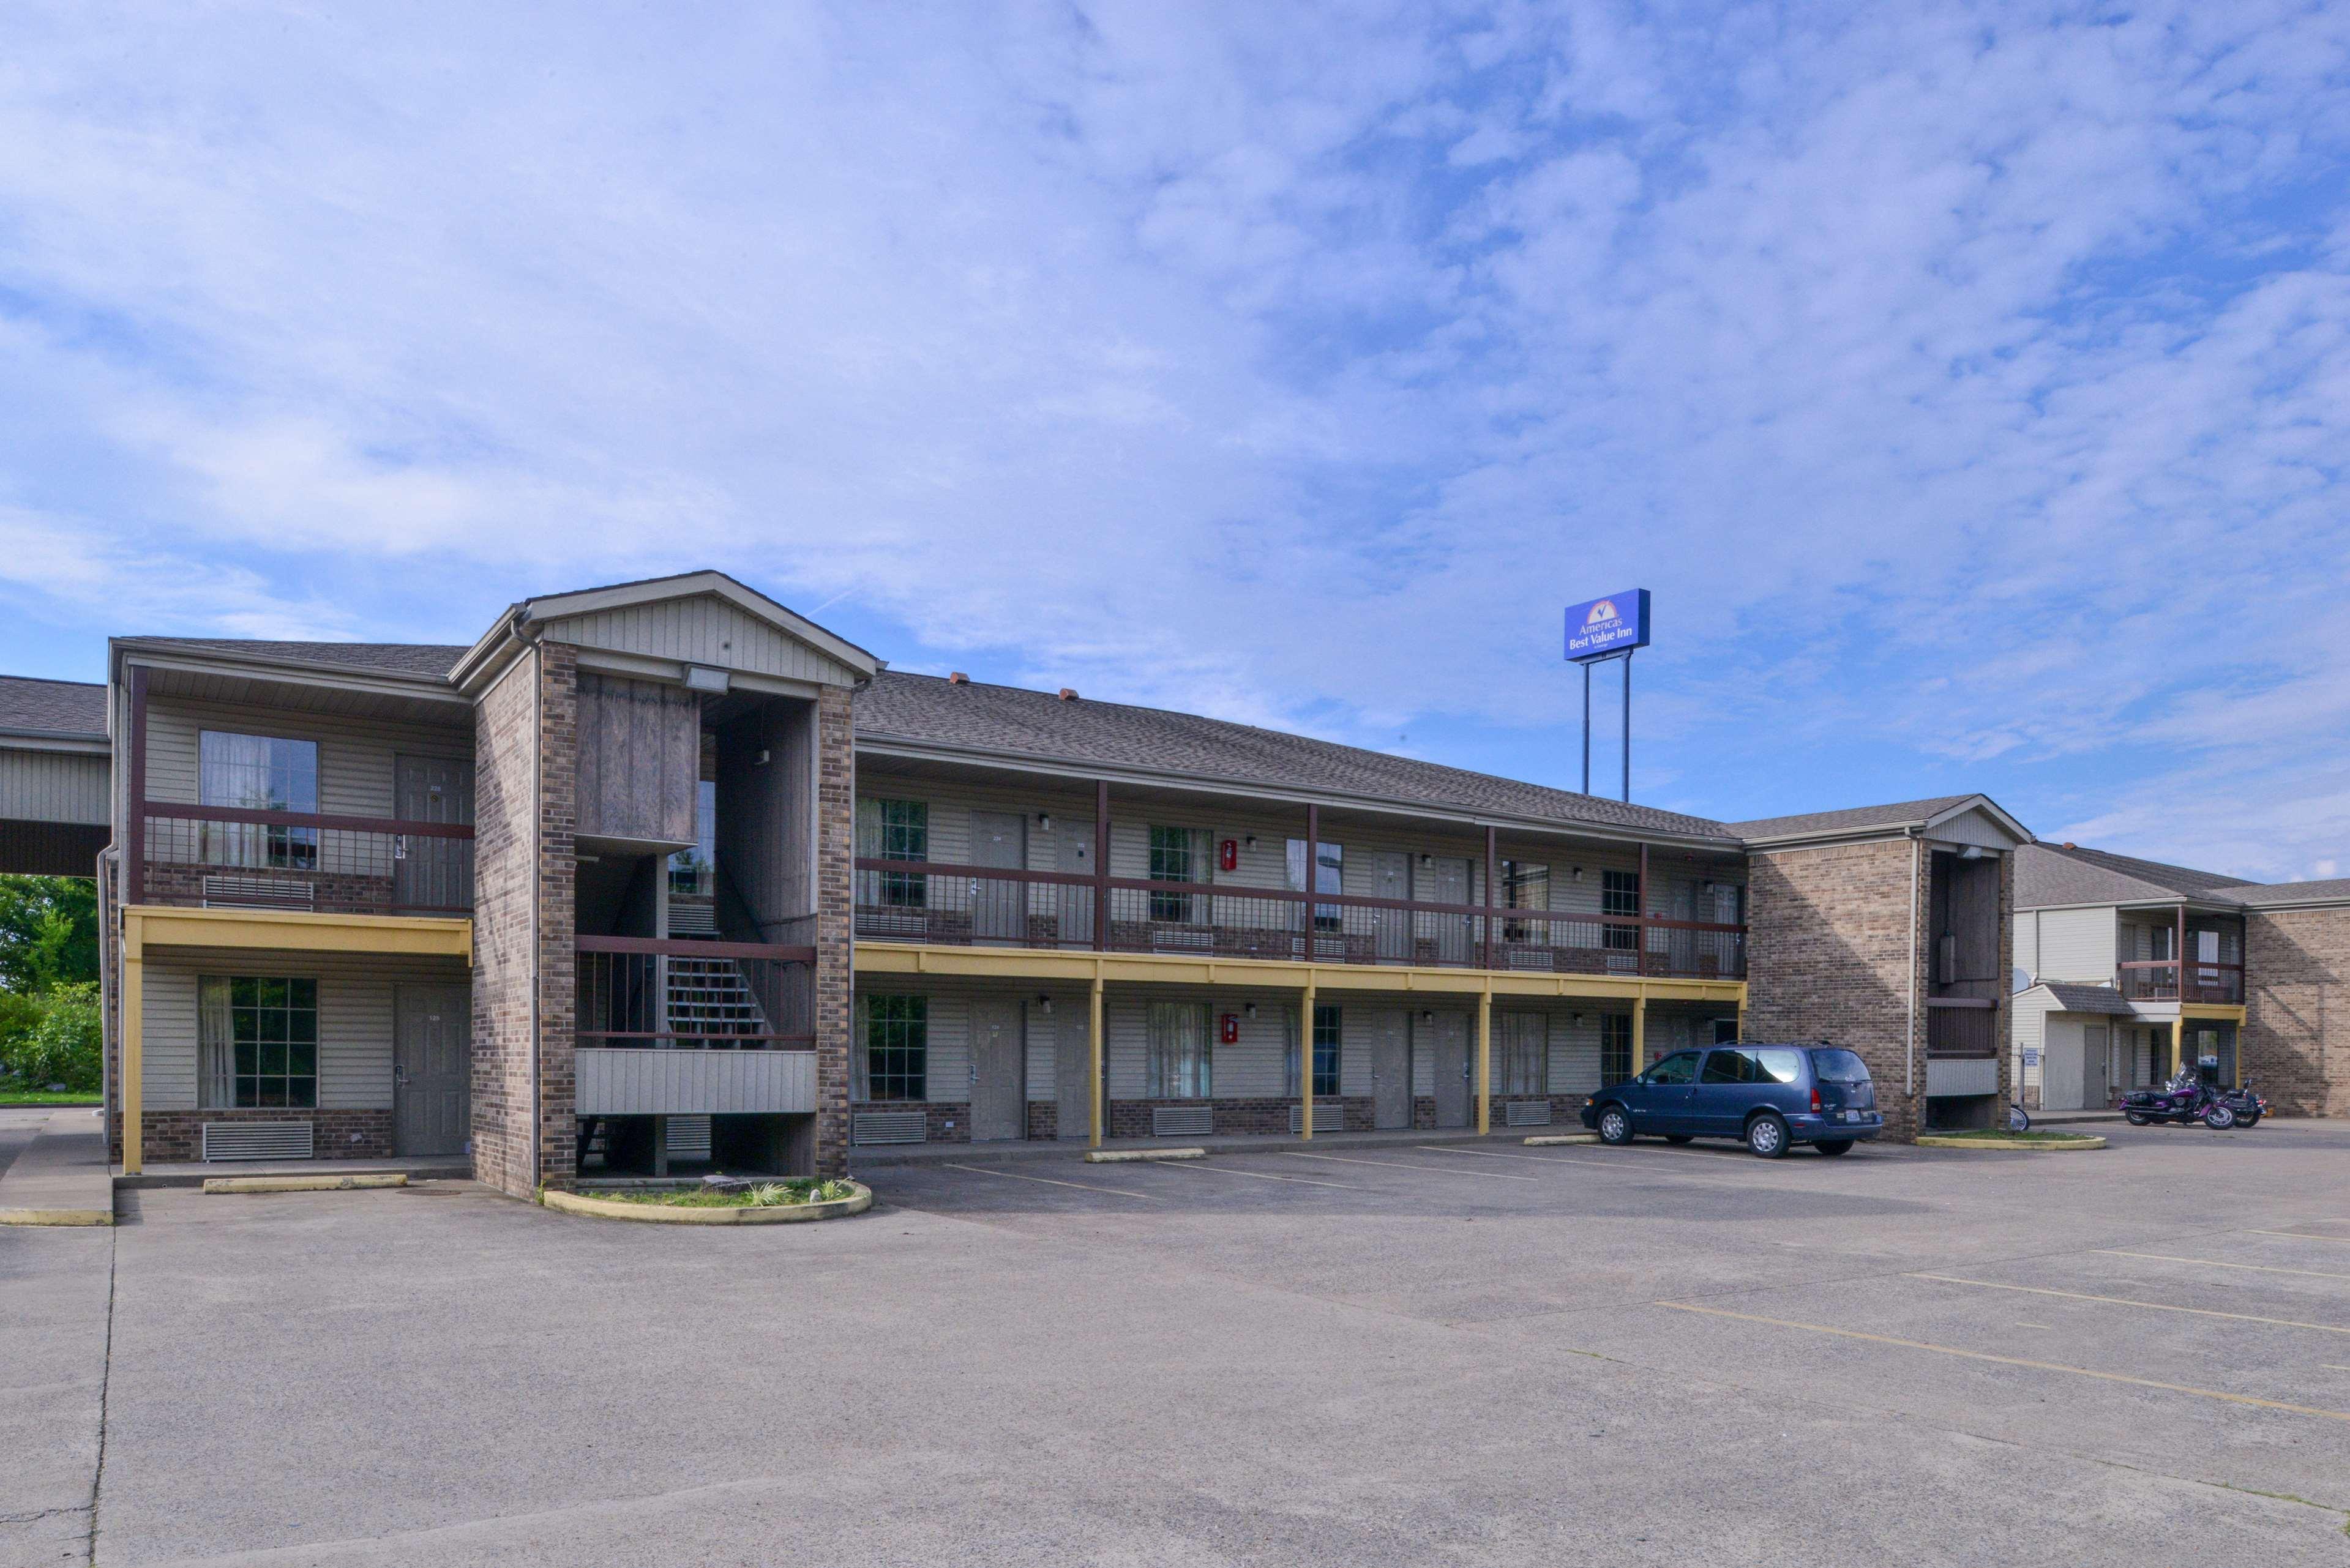 Land O Lakes Wi Hotels And Motels